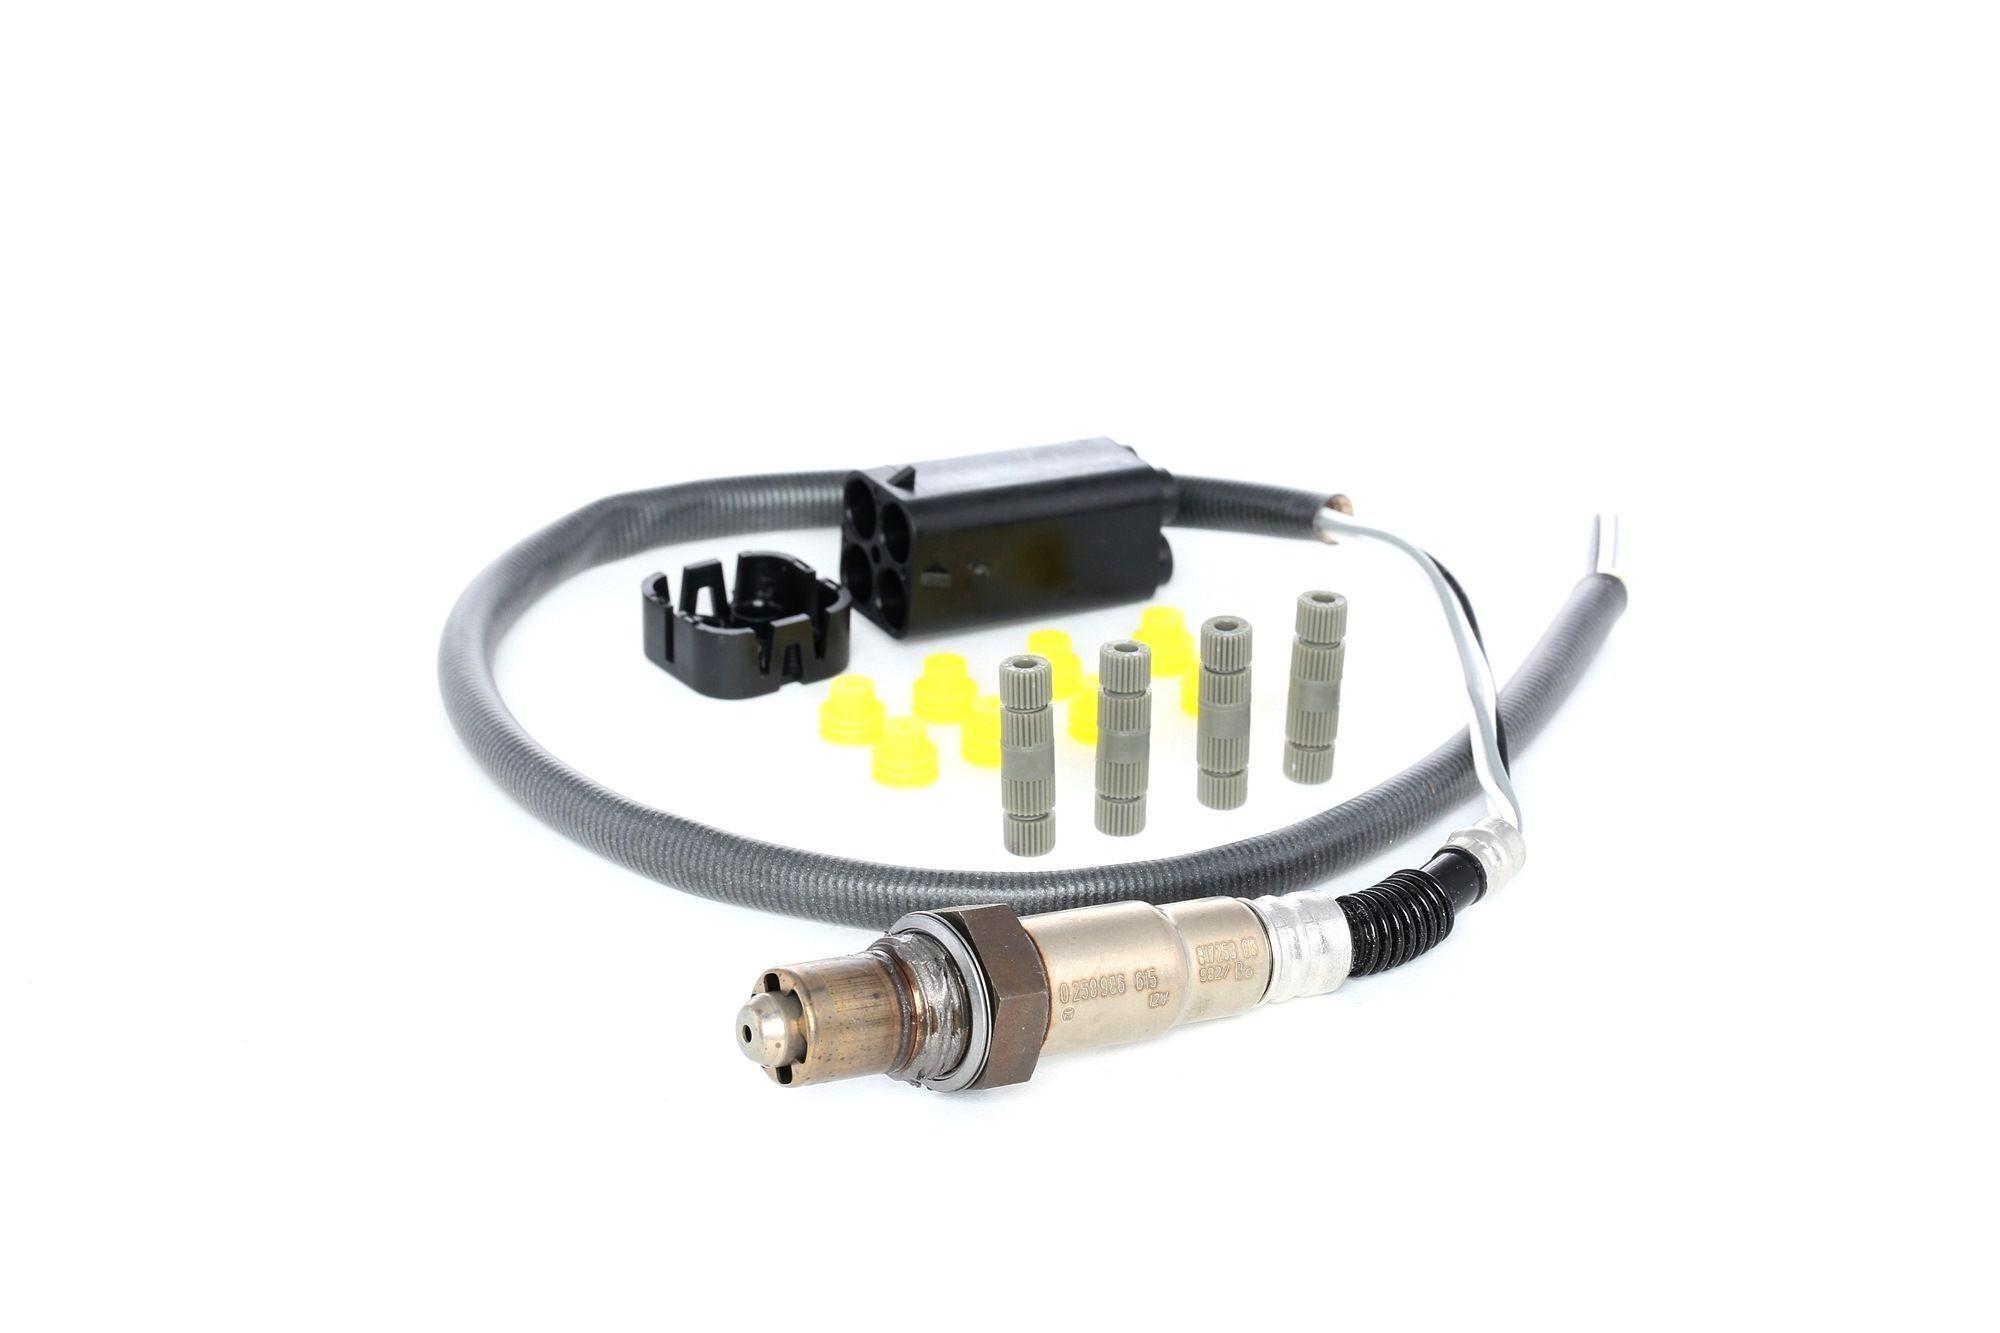 Bosch Lambdasonde VW,AUDI,ABARTH 0 258 986 615 46447510,46760863,46760865 Lambda Sensor,Regelsonde 46762182,46764207,46786048,06A906262AG,077906265J